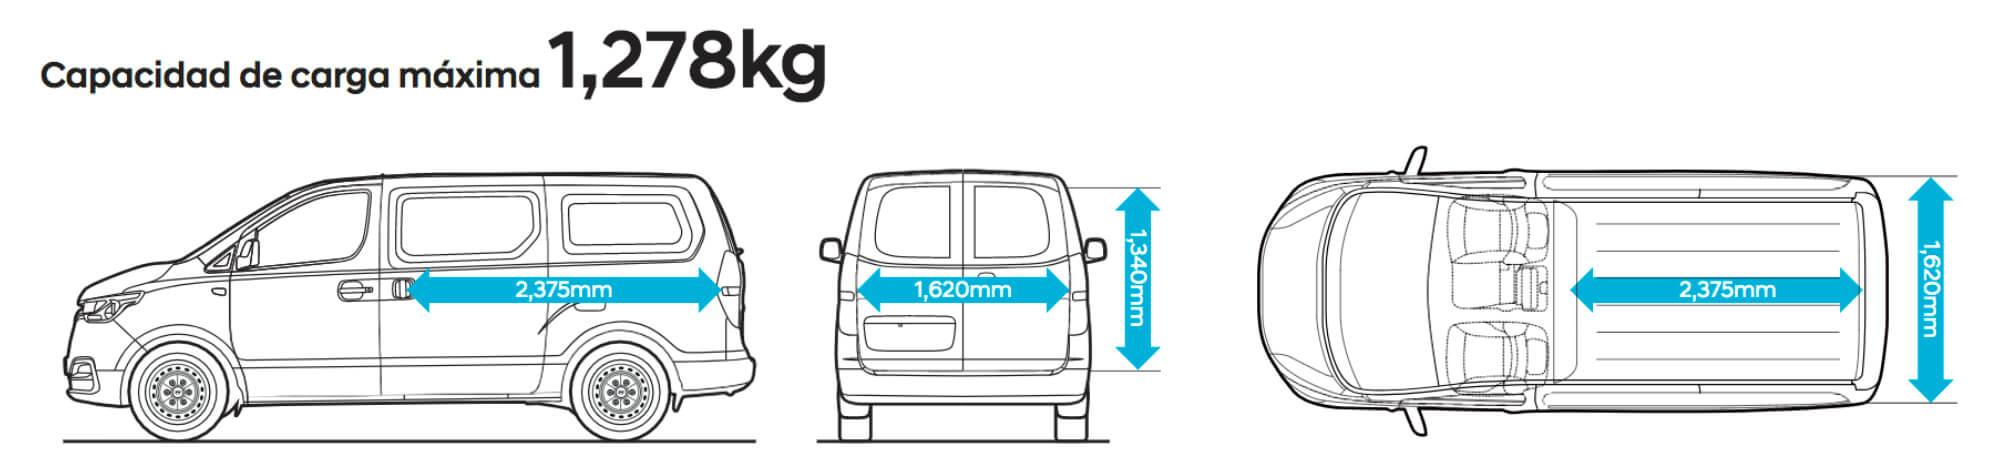 Hyundai Starex Capacidad